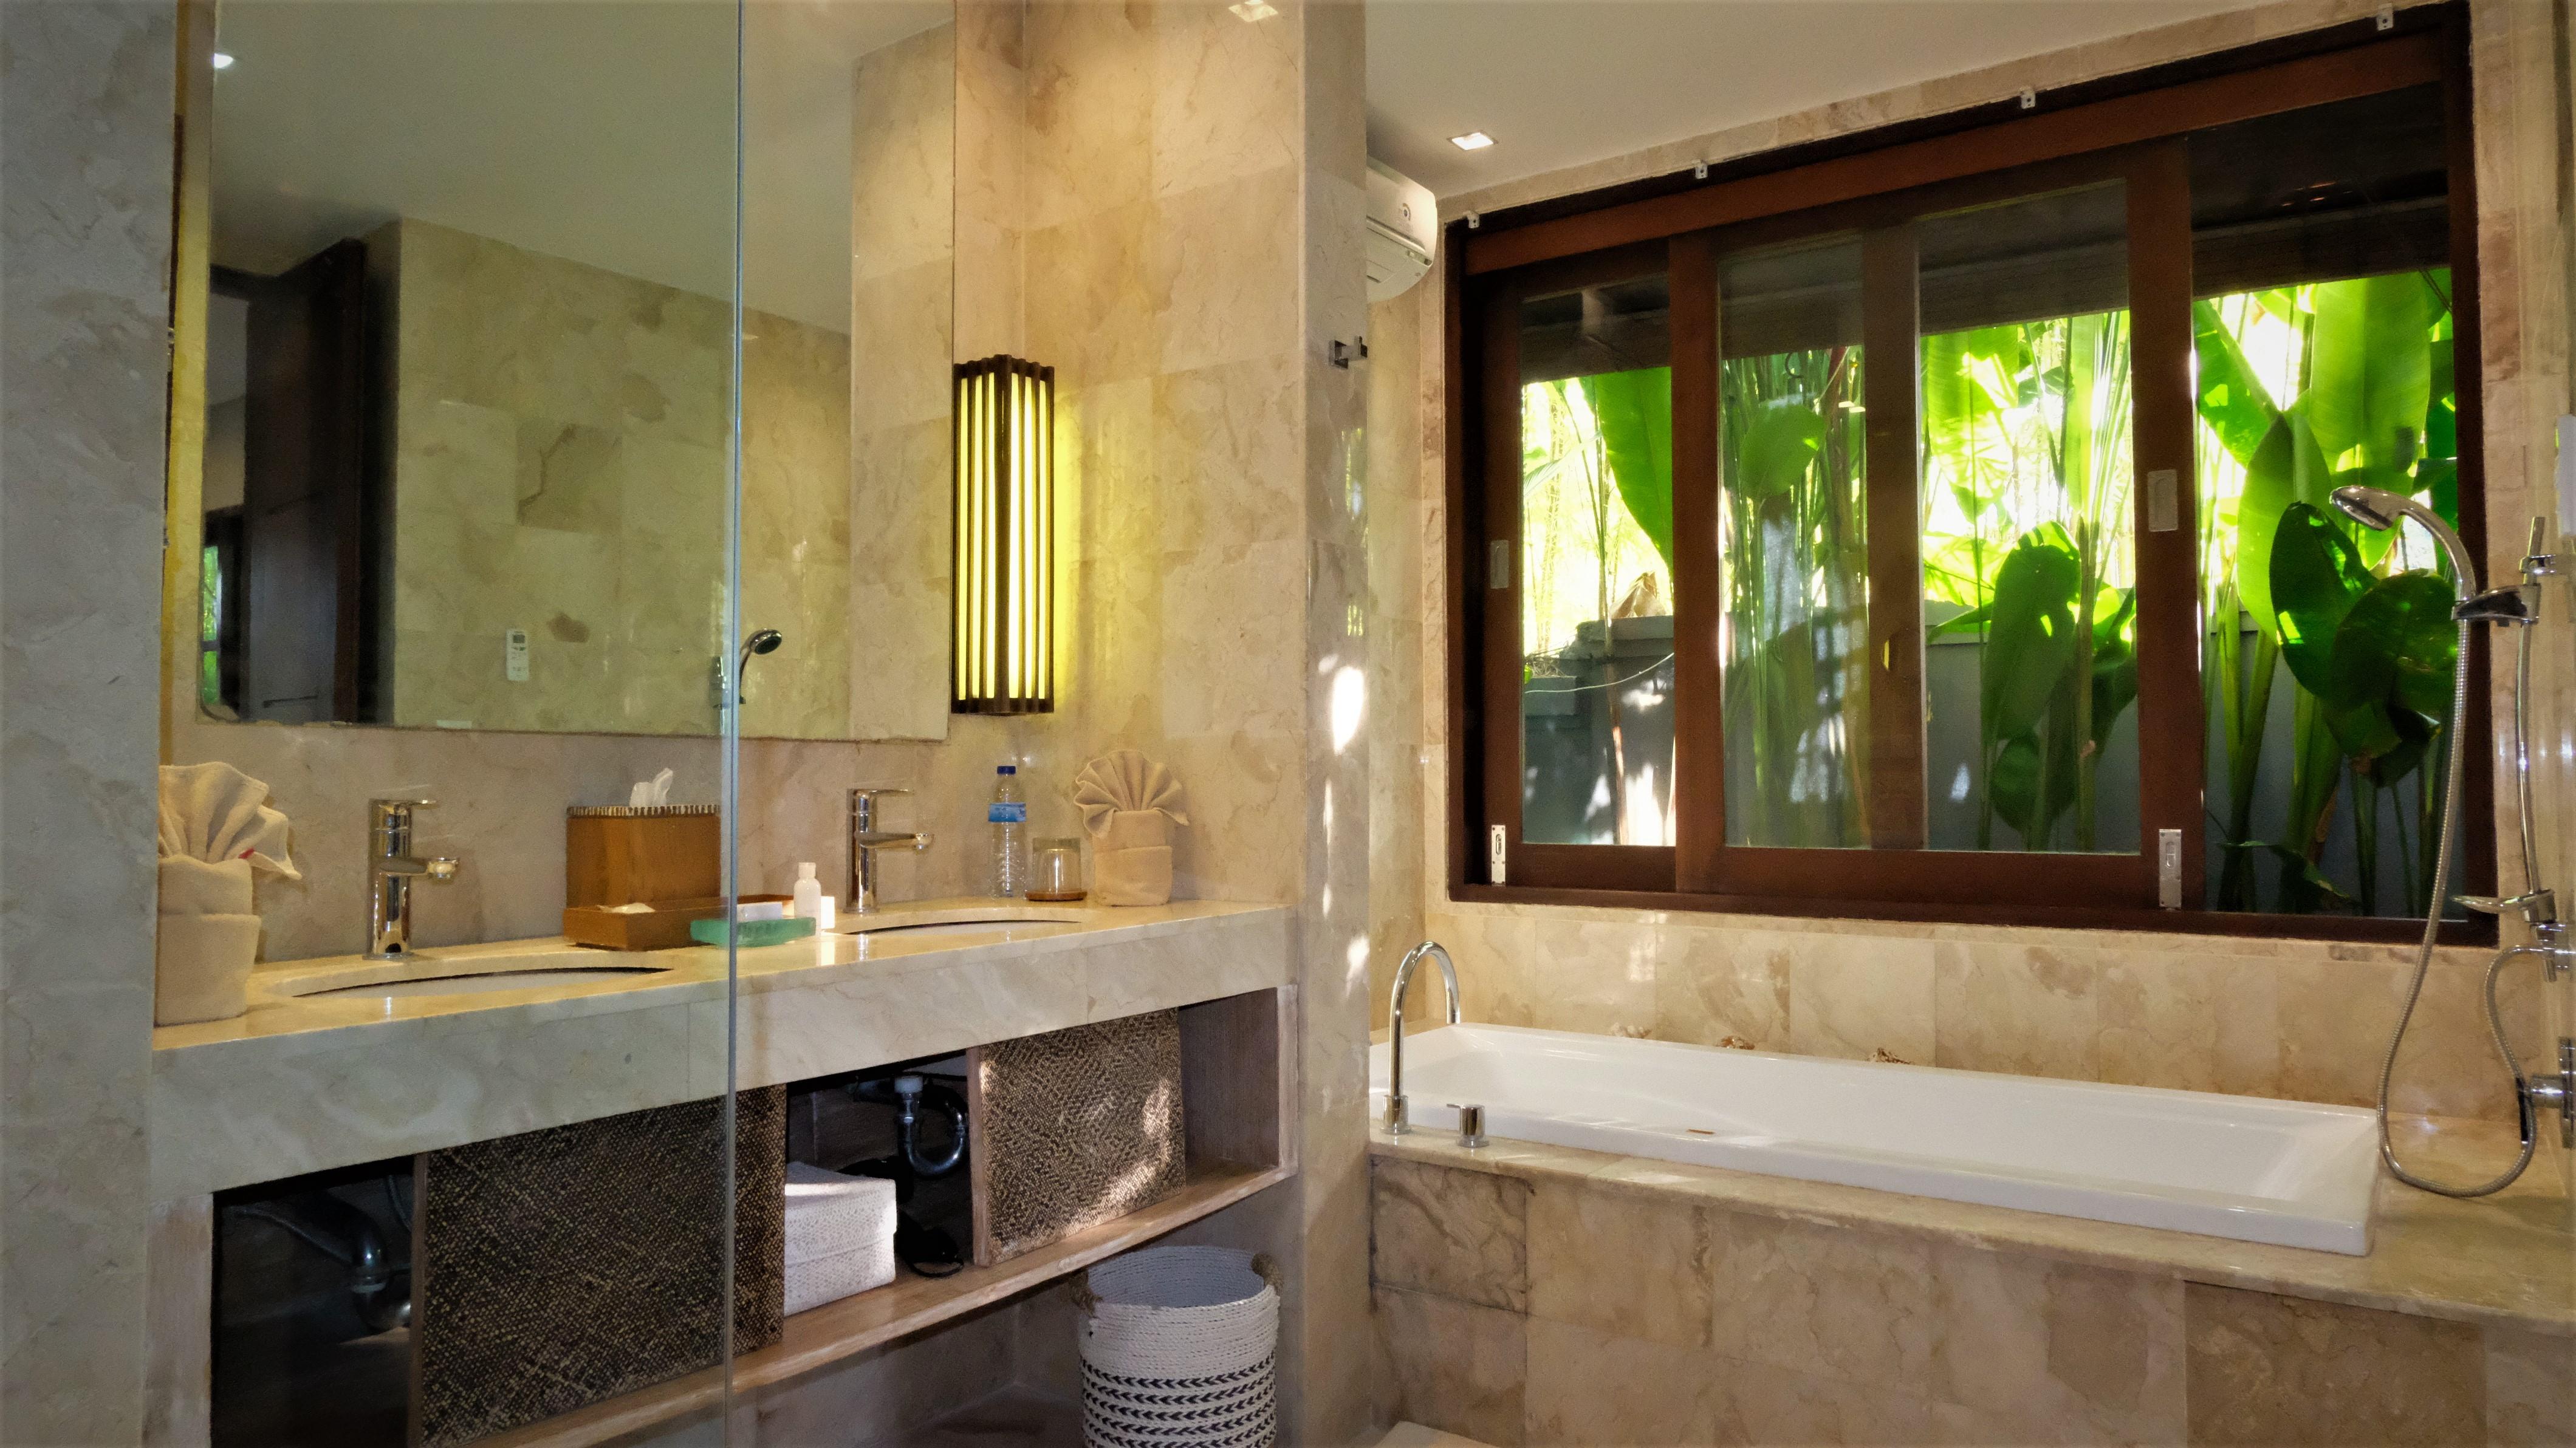 Room 1 bathtub